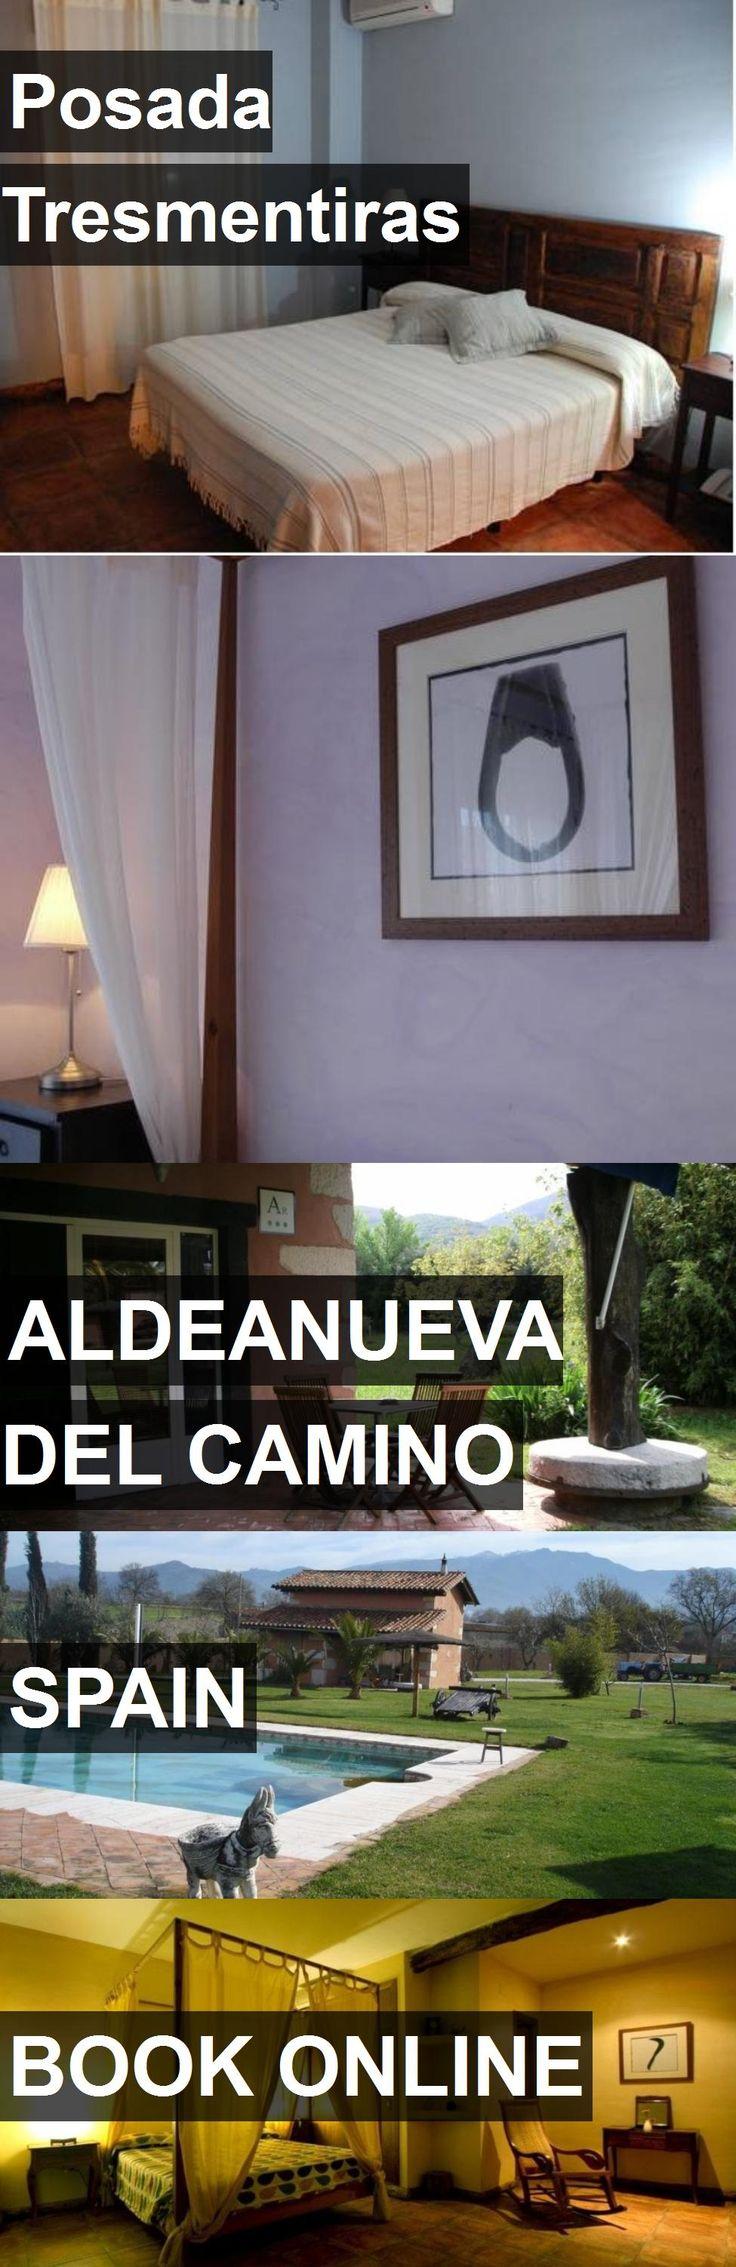 Hotel Posada Tresmentiras in Aldeanueva del Camino, Spain. For more information, photos, reviews and best prices please follow the link. #Spain #AldeanuevadelCamino #hotel #travel #vacation